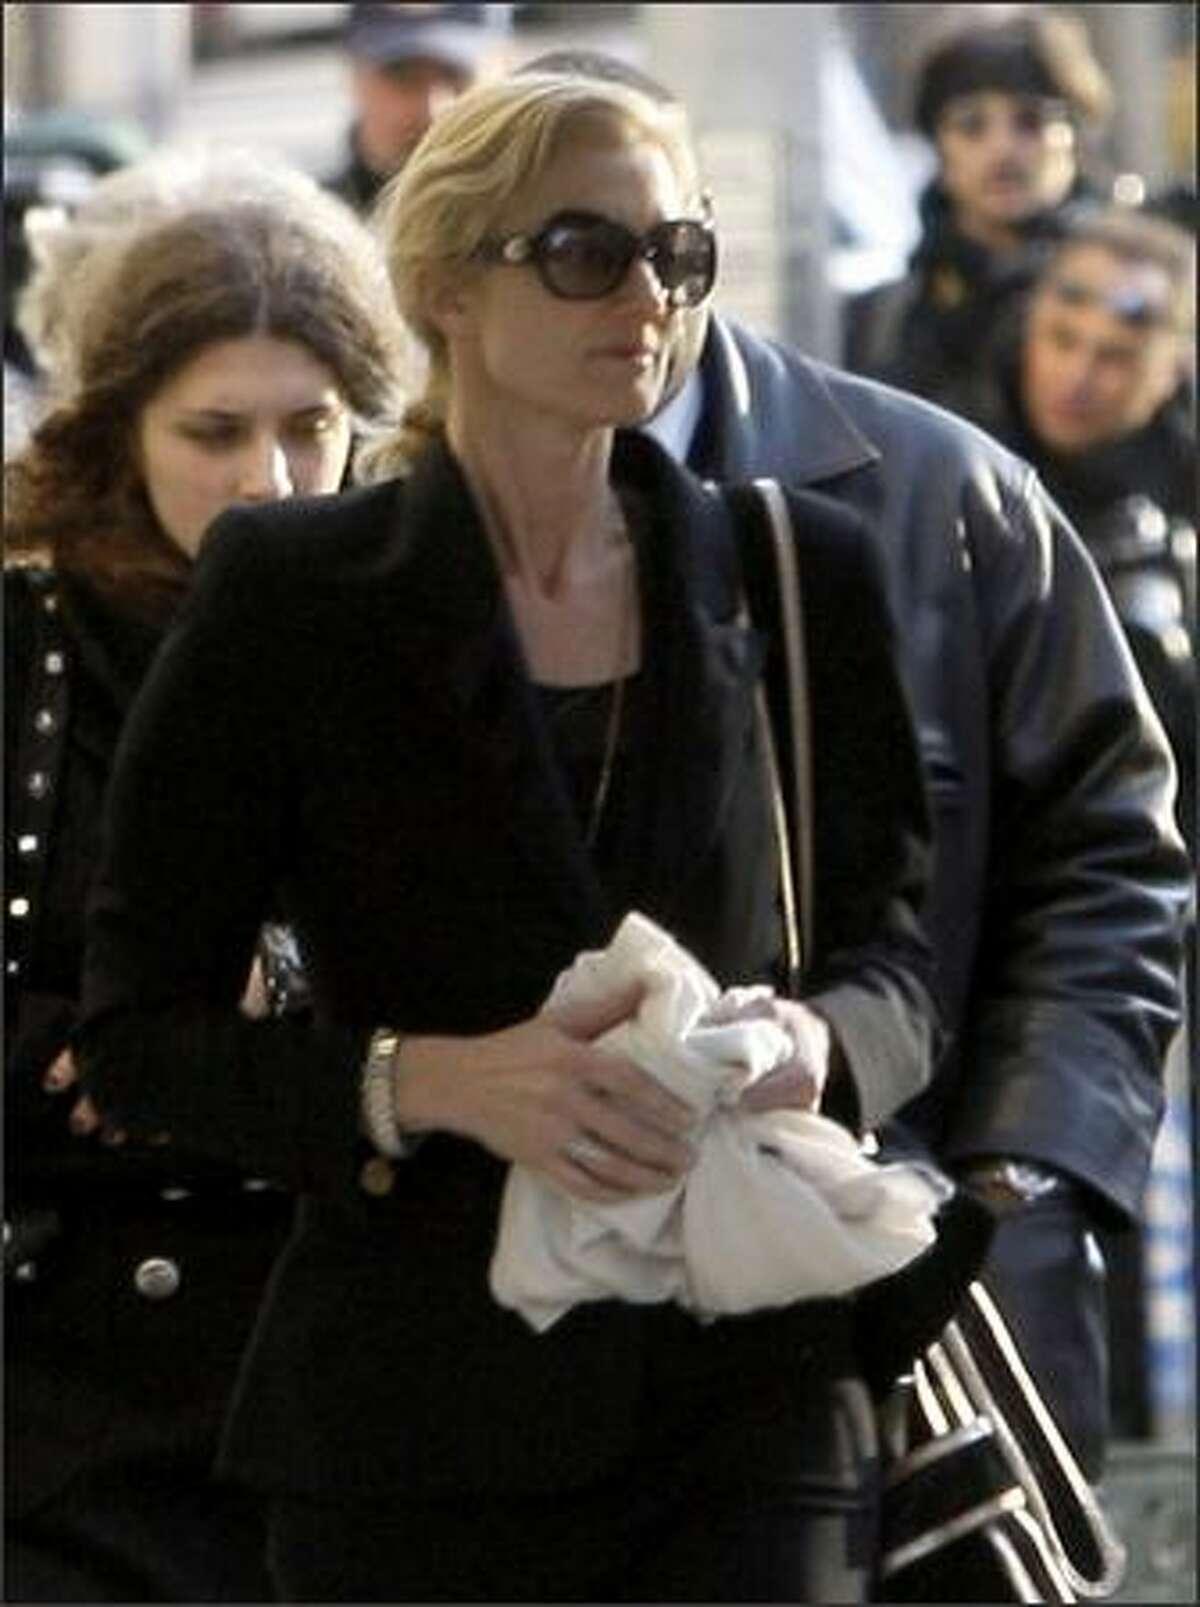 Joely Richardson, sister of Natasha Richardson, leaves a private wake for Natasha Richardson at New York's American Irish Historical Society. (AP Photo/Frank Franklin II)